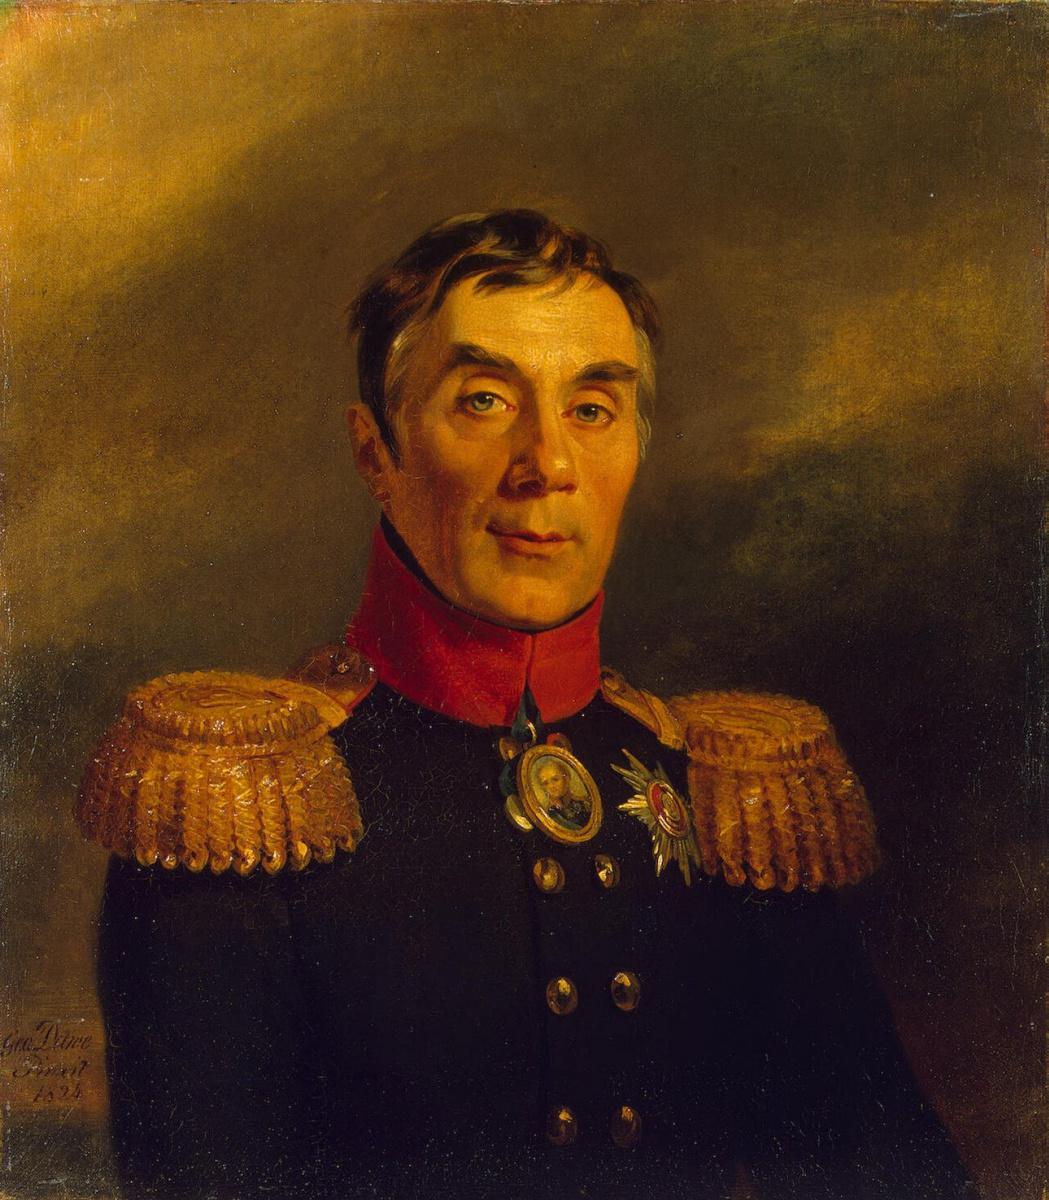 Джордж Доу. Портрет Алексея Андреевича Аракчеева